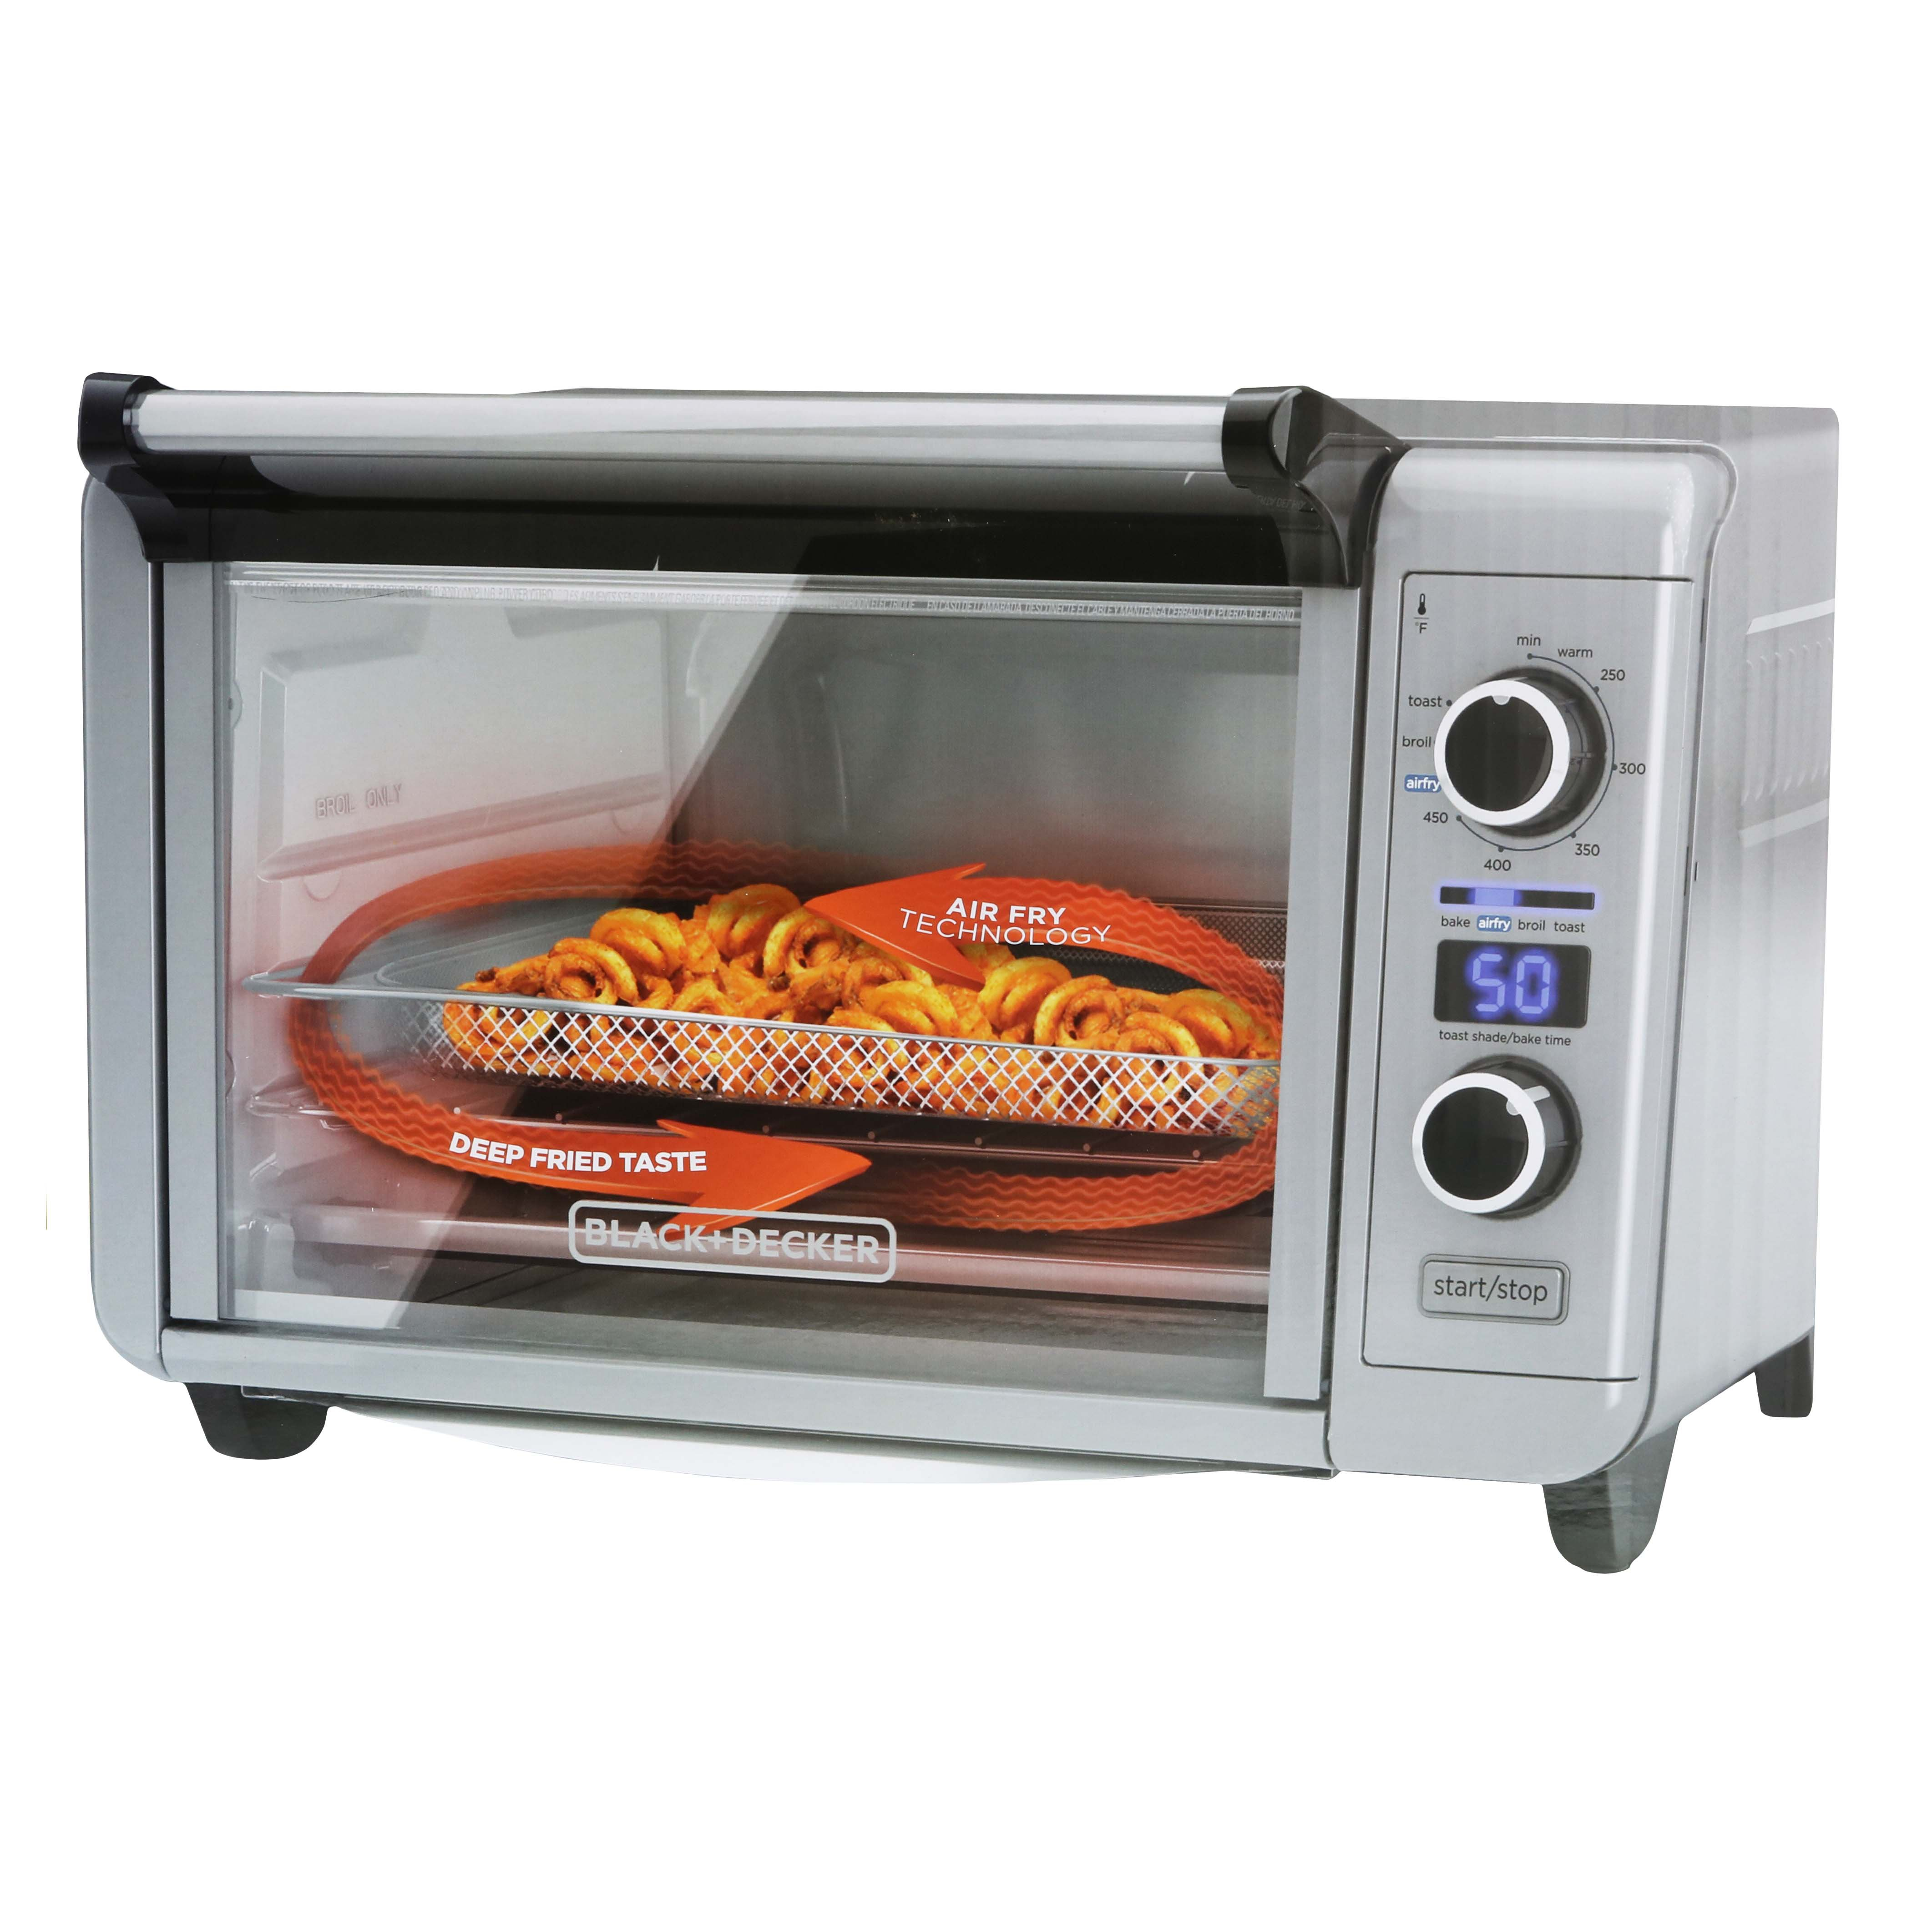 Black & Decker Crisp n' Bake Air Fryer Toaster Oven - Shop ...